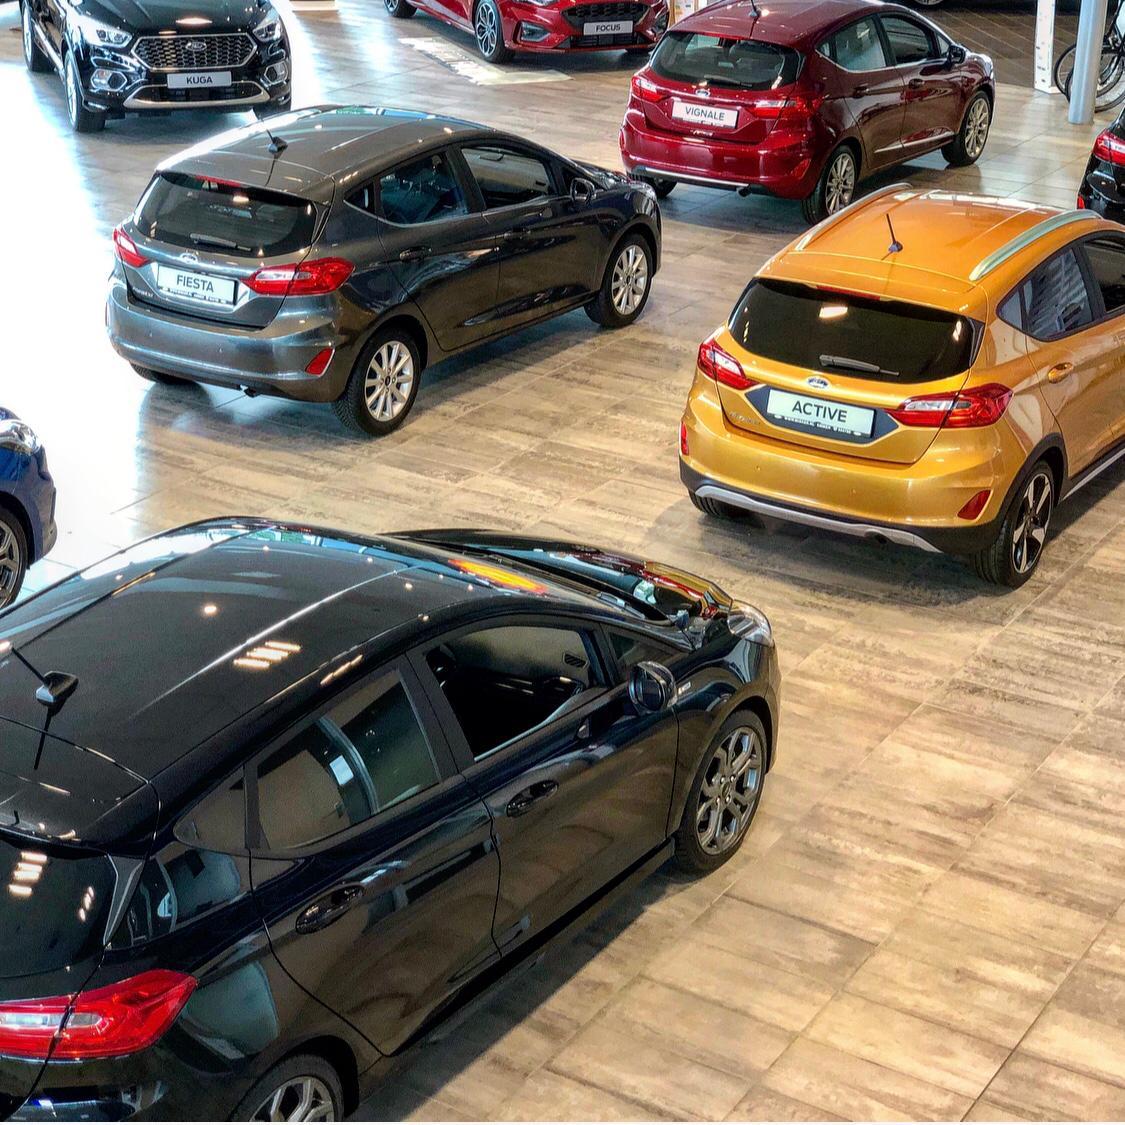 Ford Fiesta in showroom